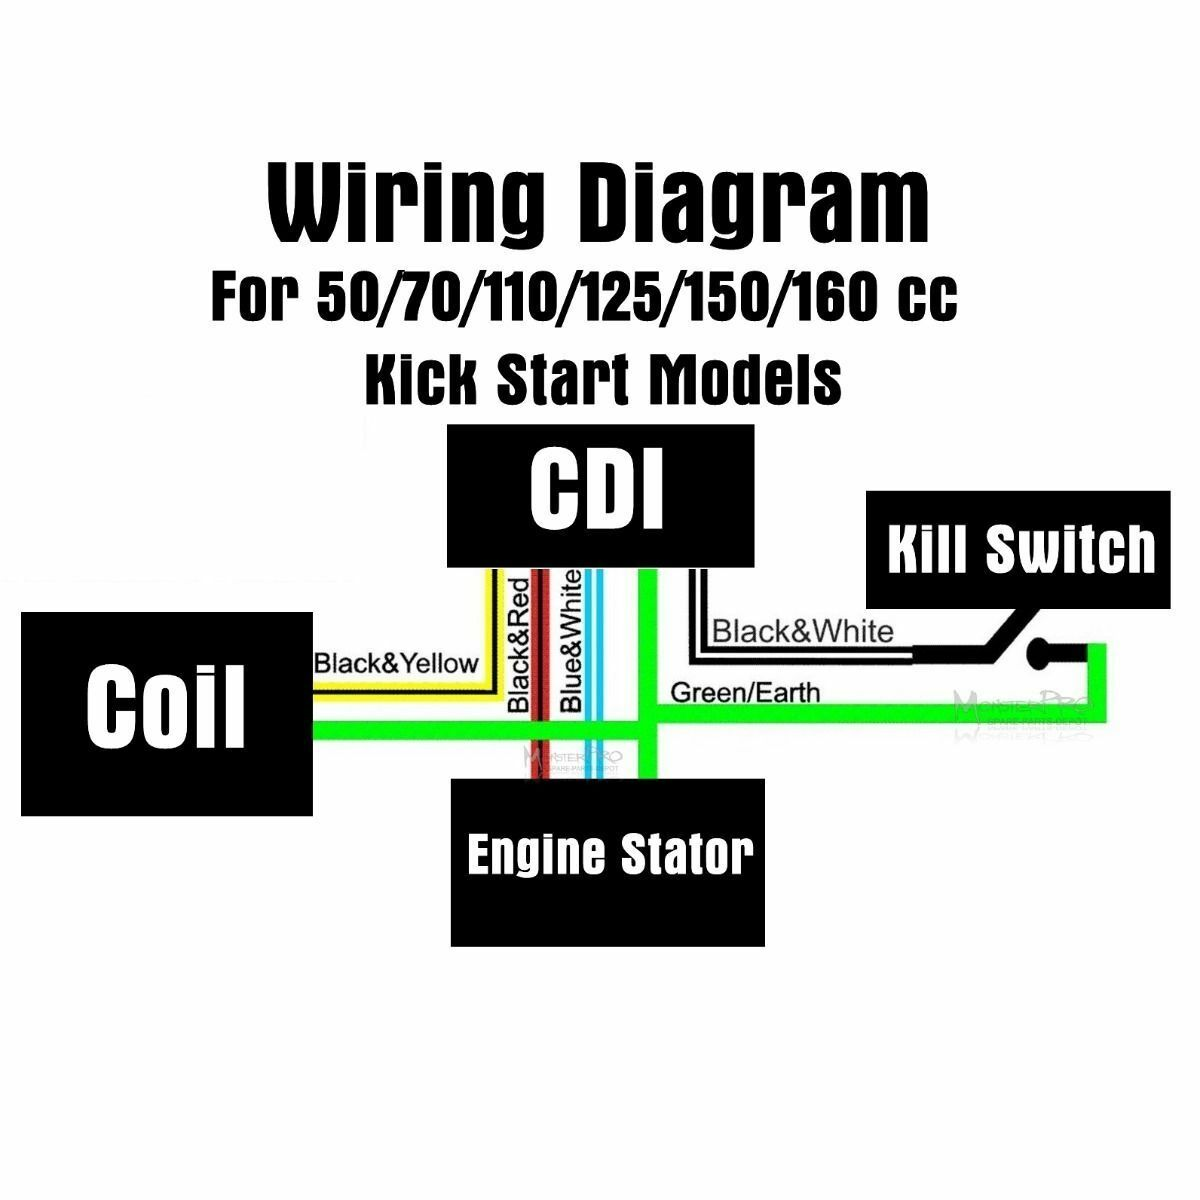 $_10?set_id=880000500F coil cdi spark plug for 50cc 70cc 90cc 110cc quad dirt atv pit atomik 110cc quad wiring diagram at panicattacktreatment.co